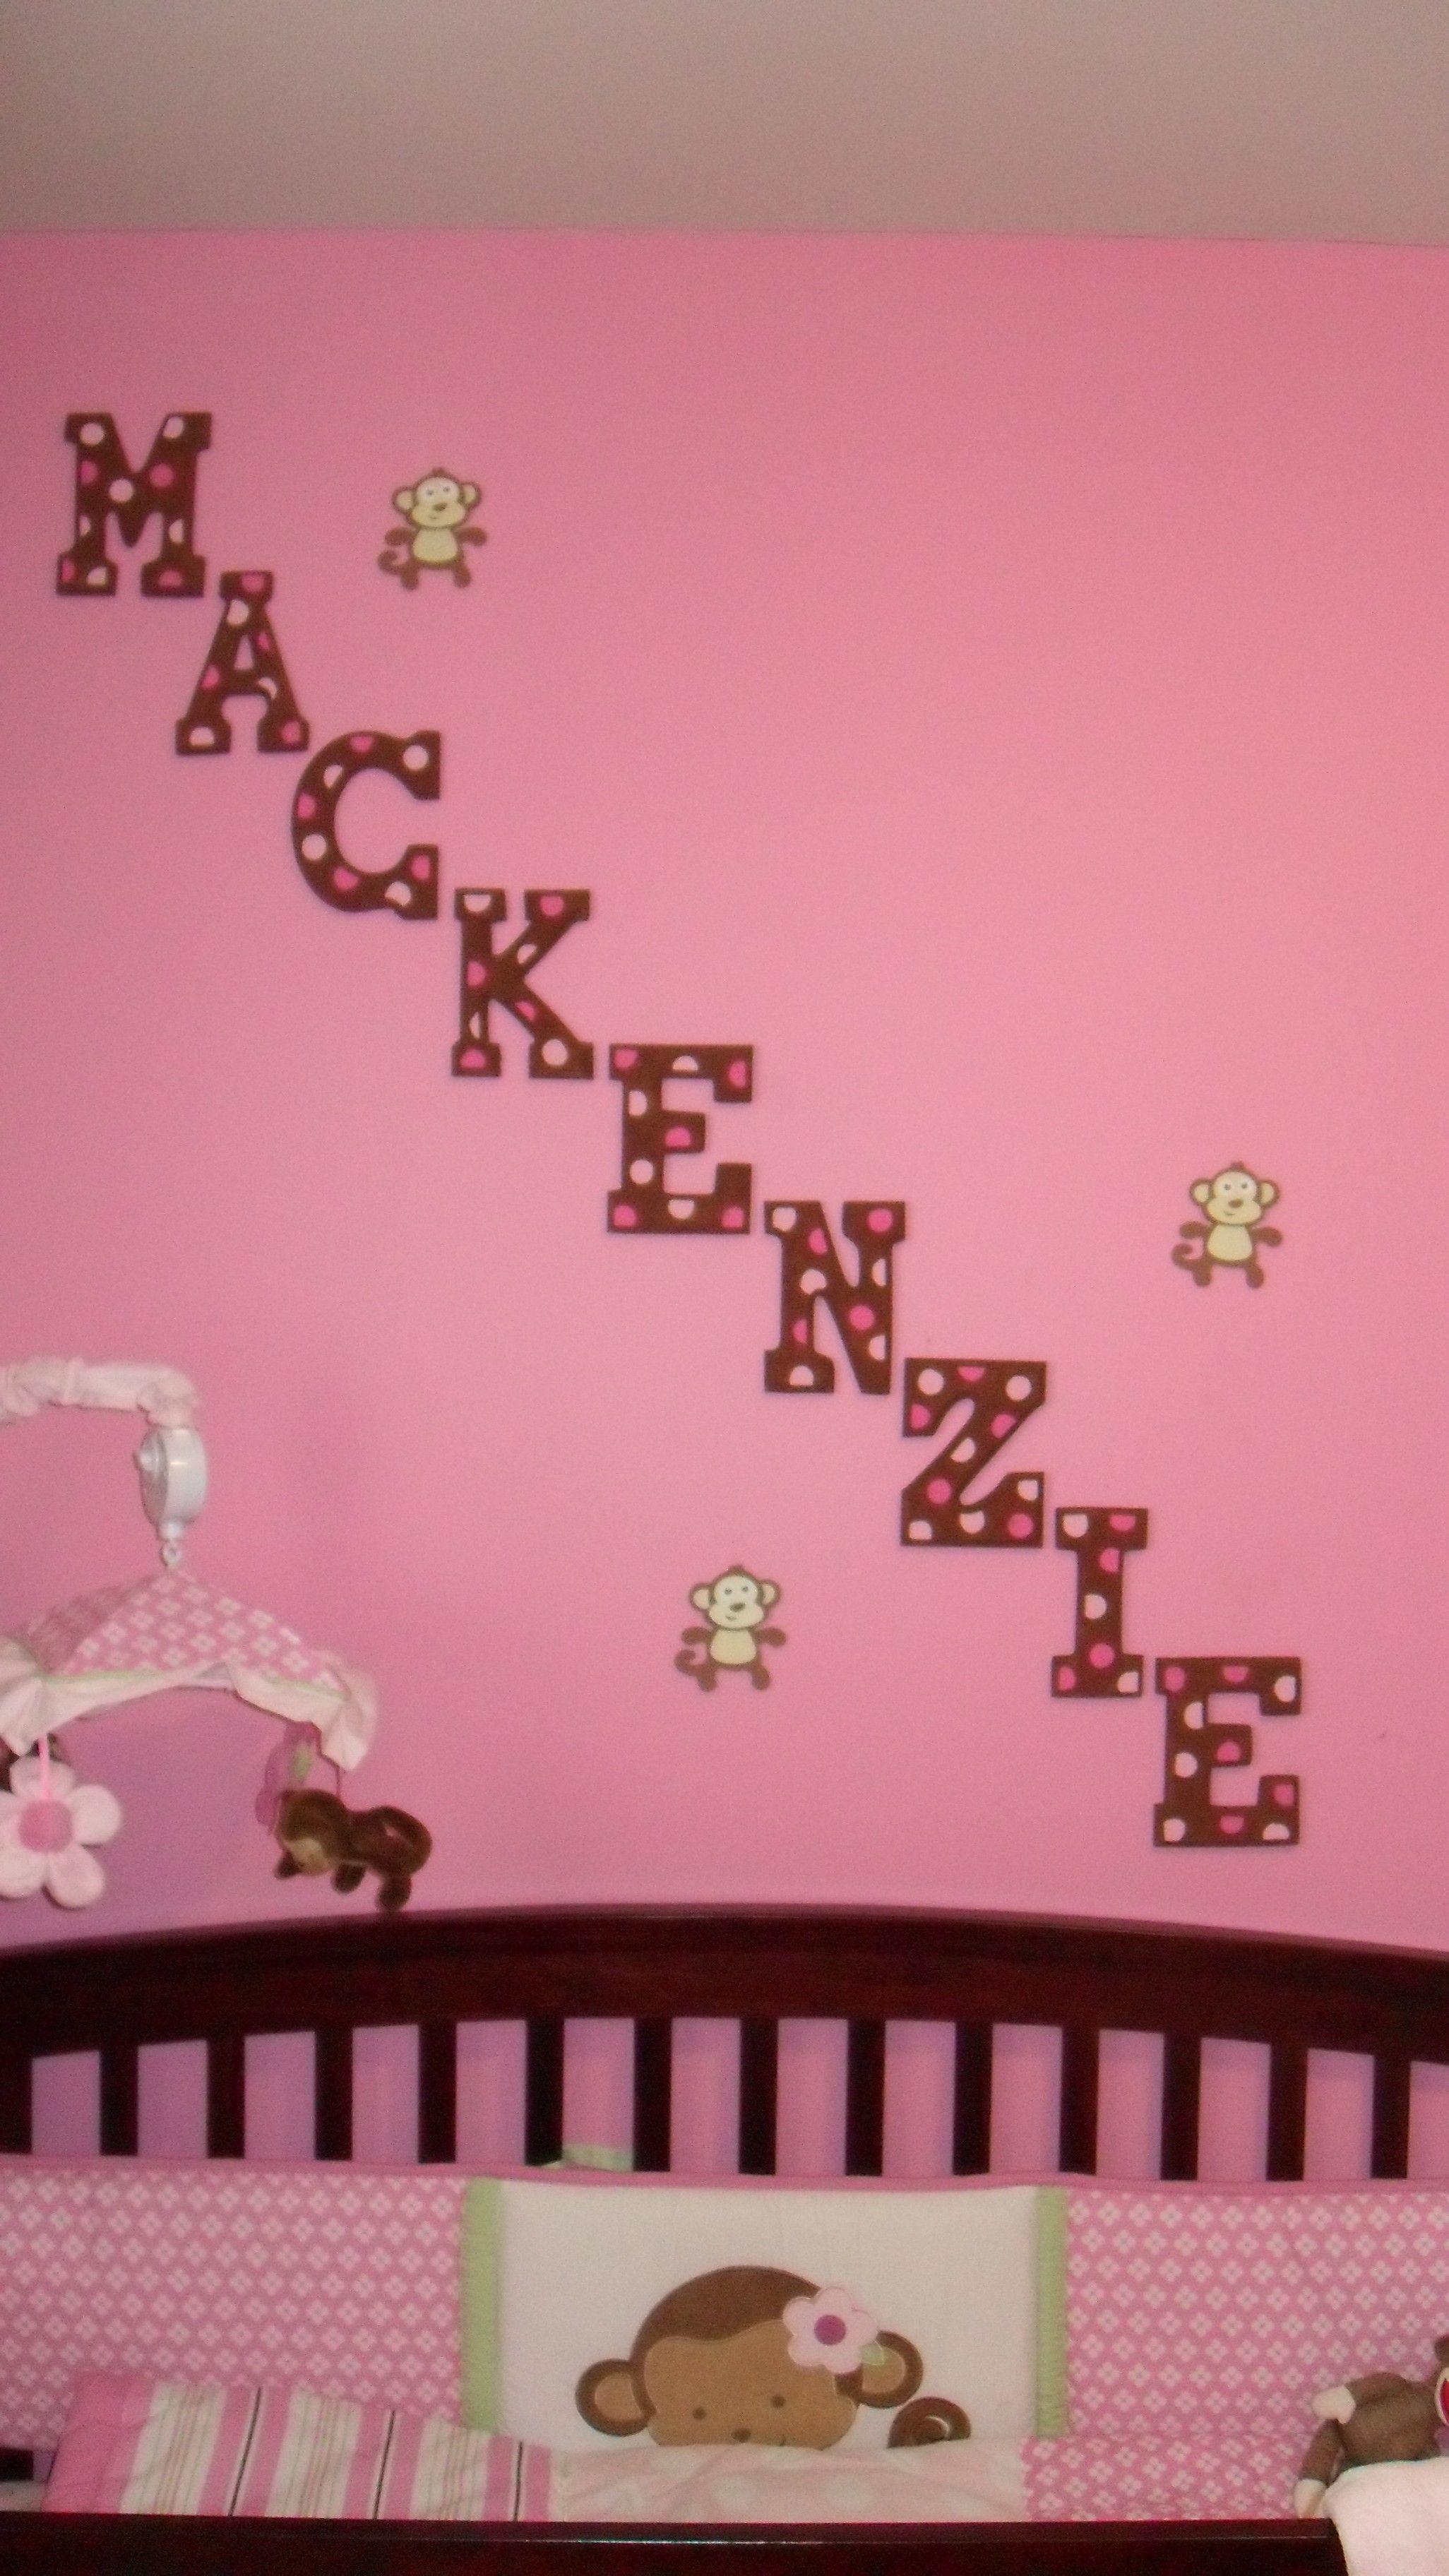 Diy Wooden Letters Lt 3 Nursery Room Decor